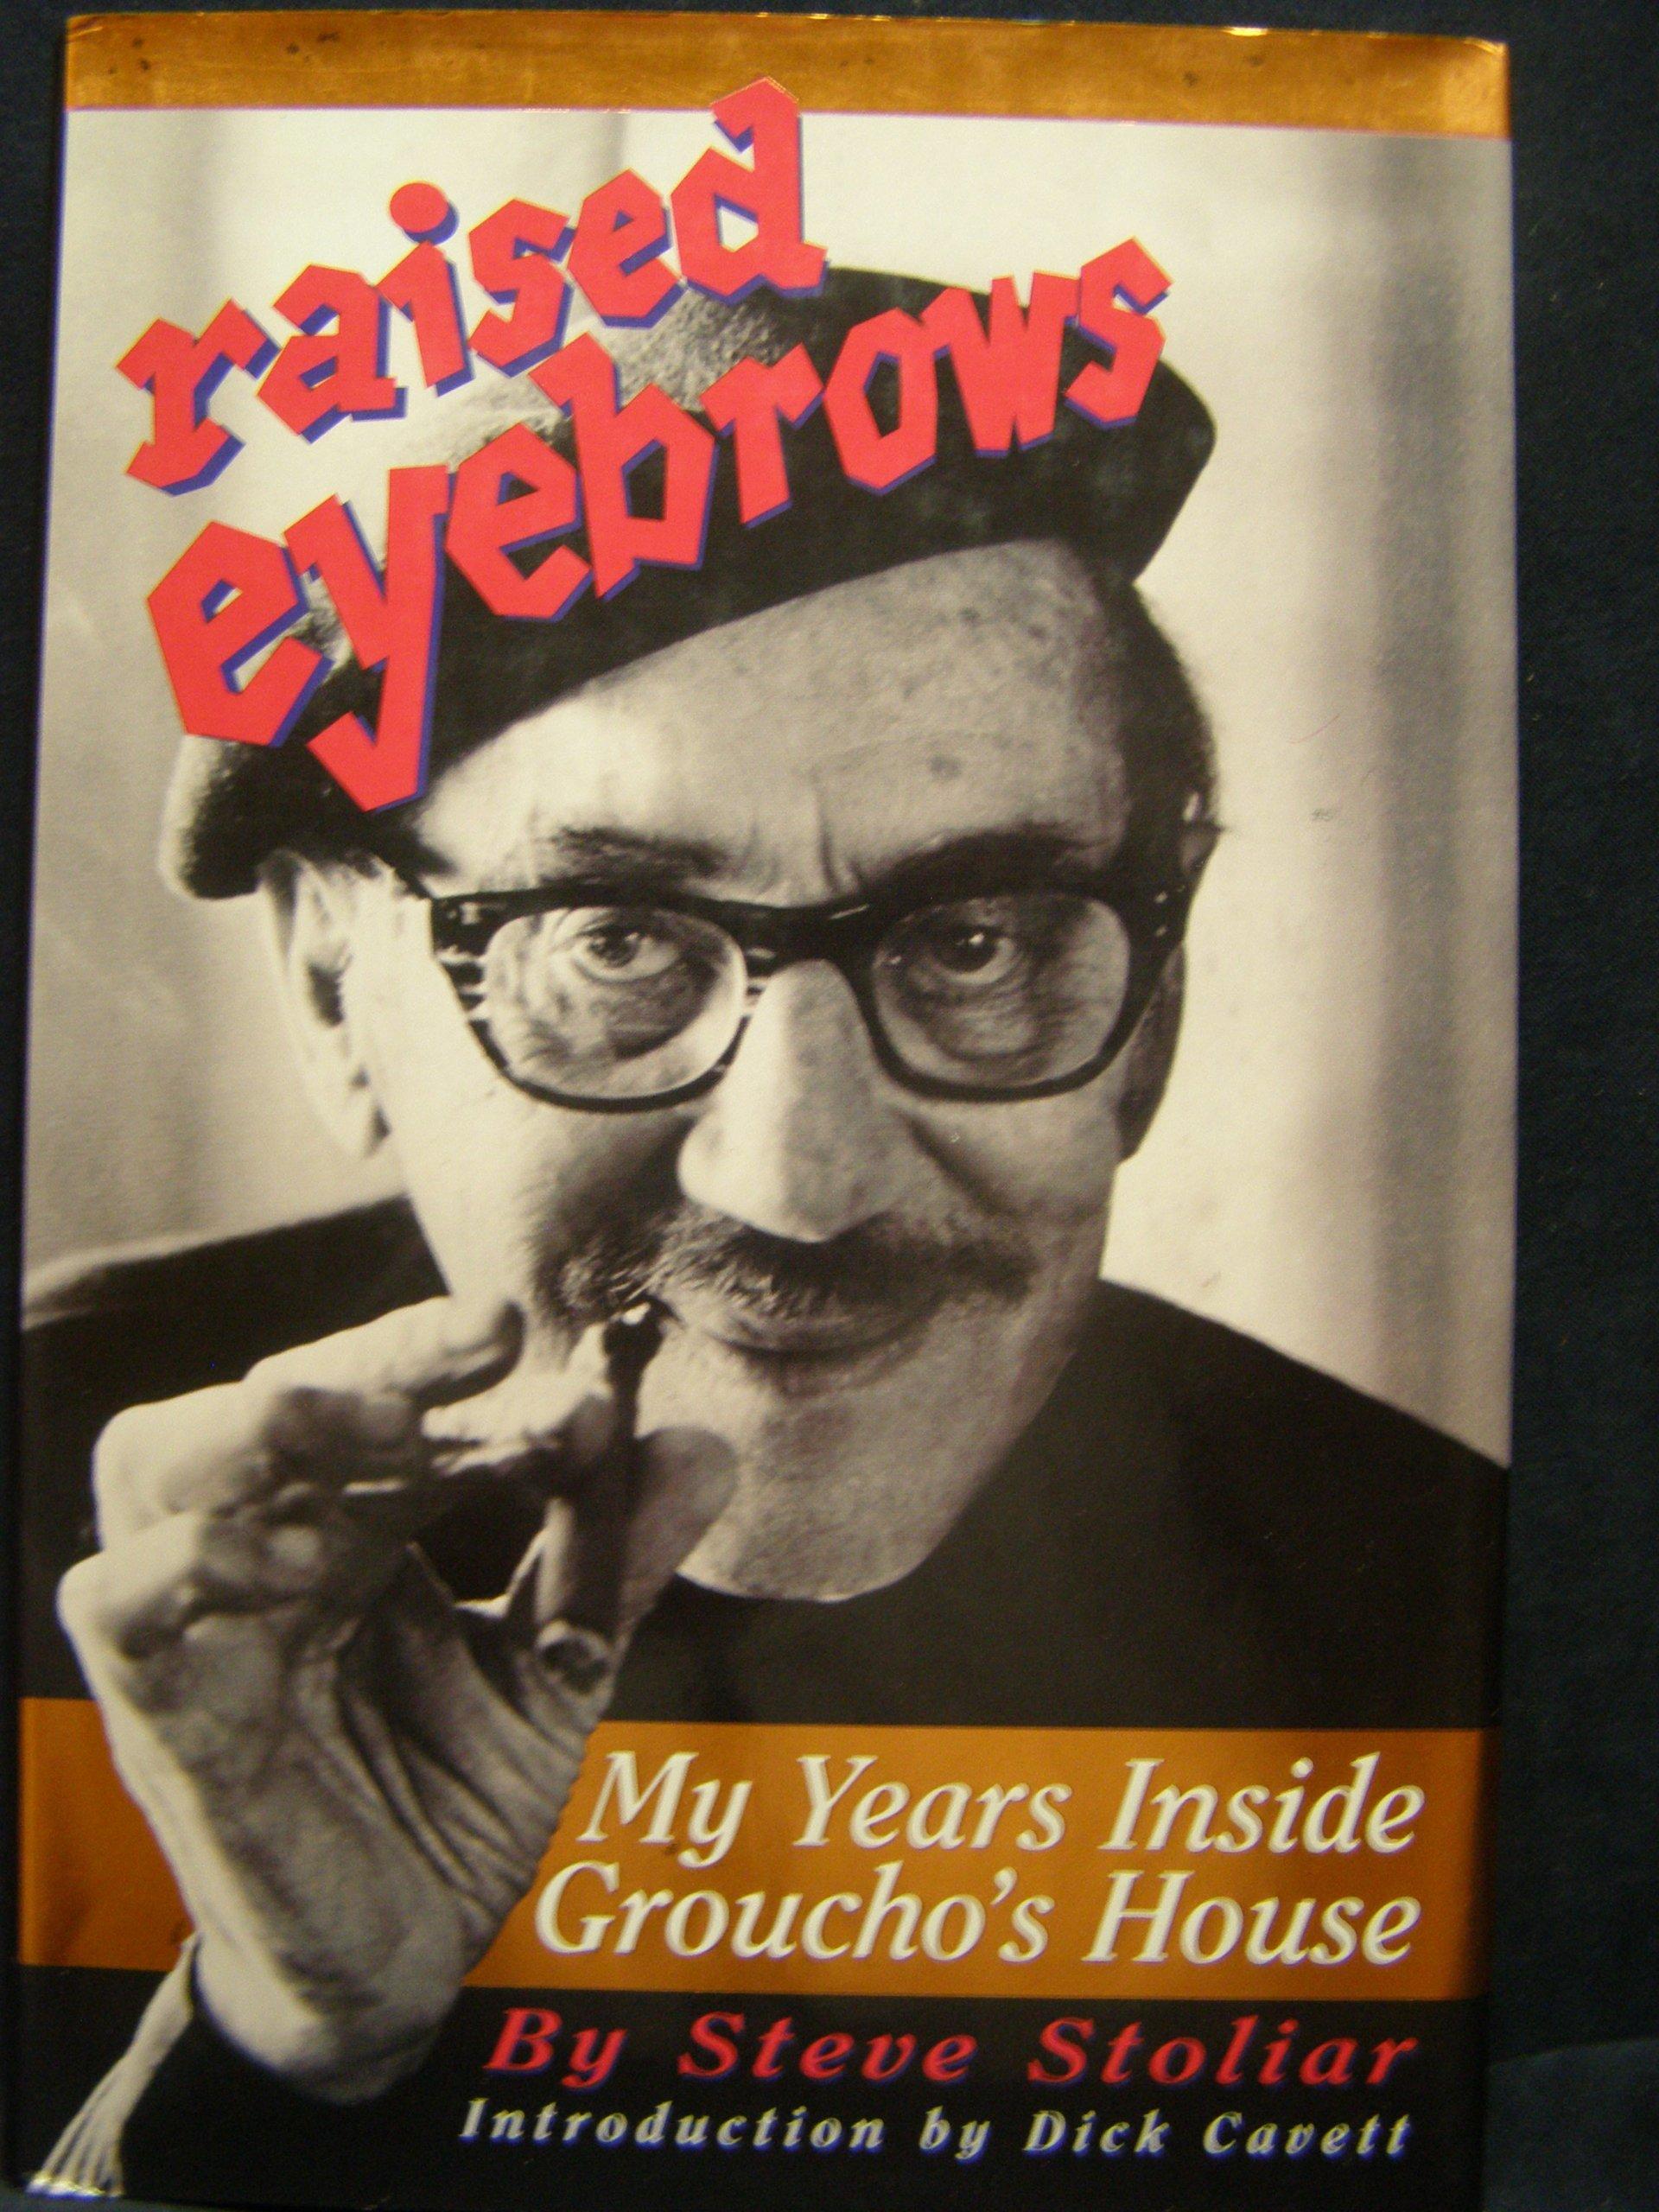 Raised Eyebrows My Years Inside Grouchos House Steve Stoliar